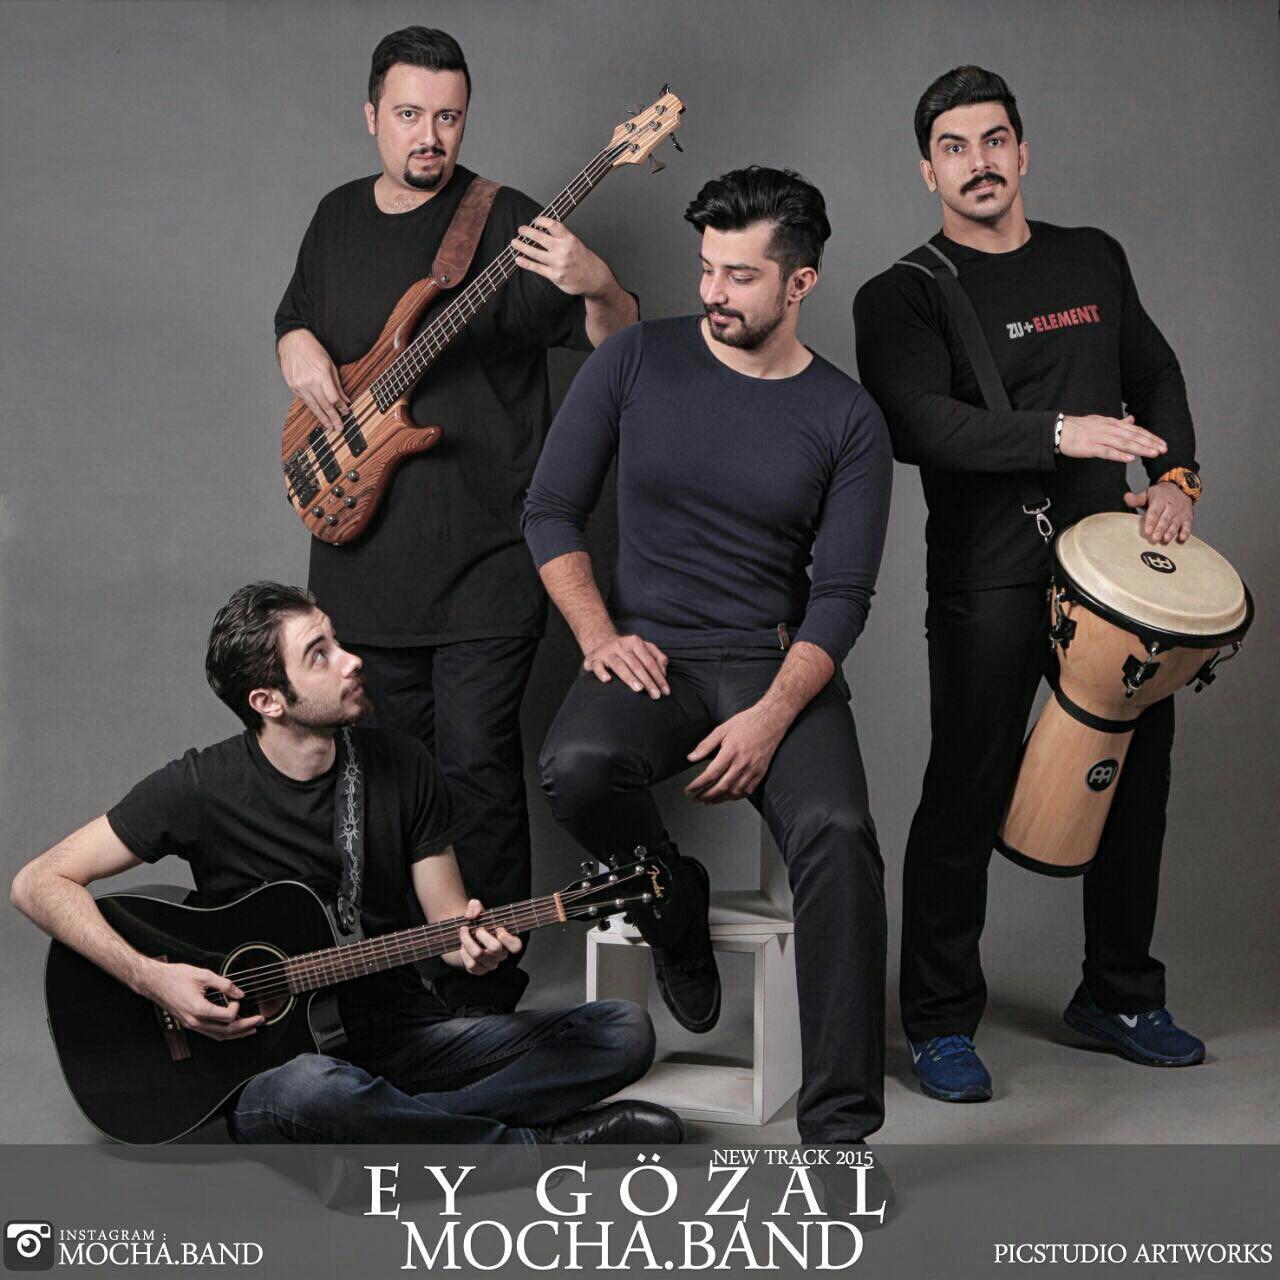 http://s8.picofile.com/file/8300687742/113Mocha_Band_Ey_Gozal.jpg